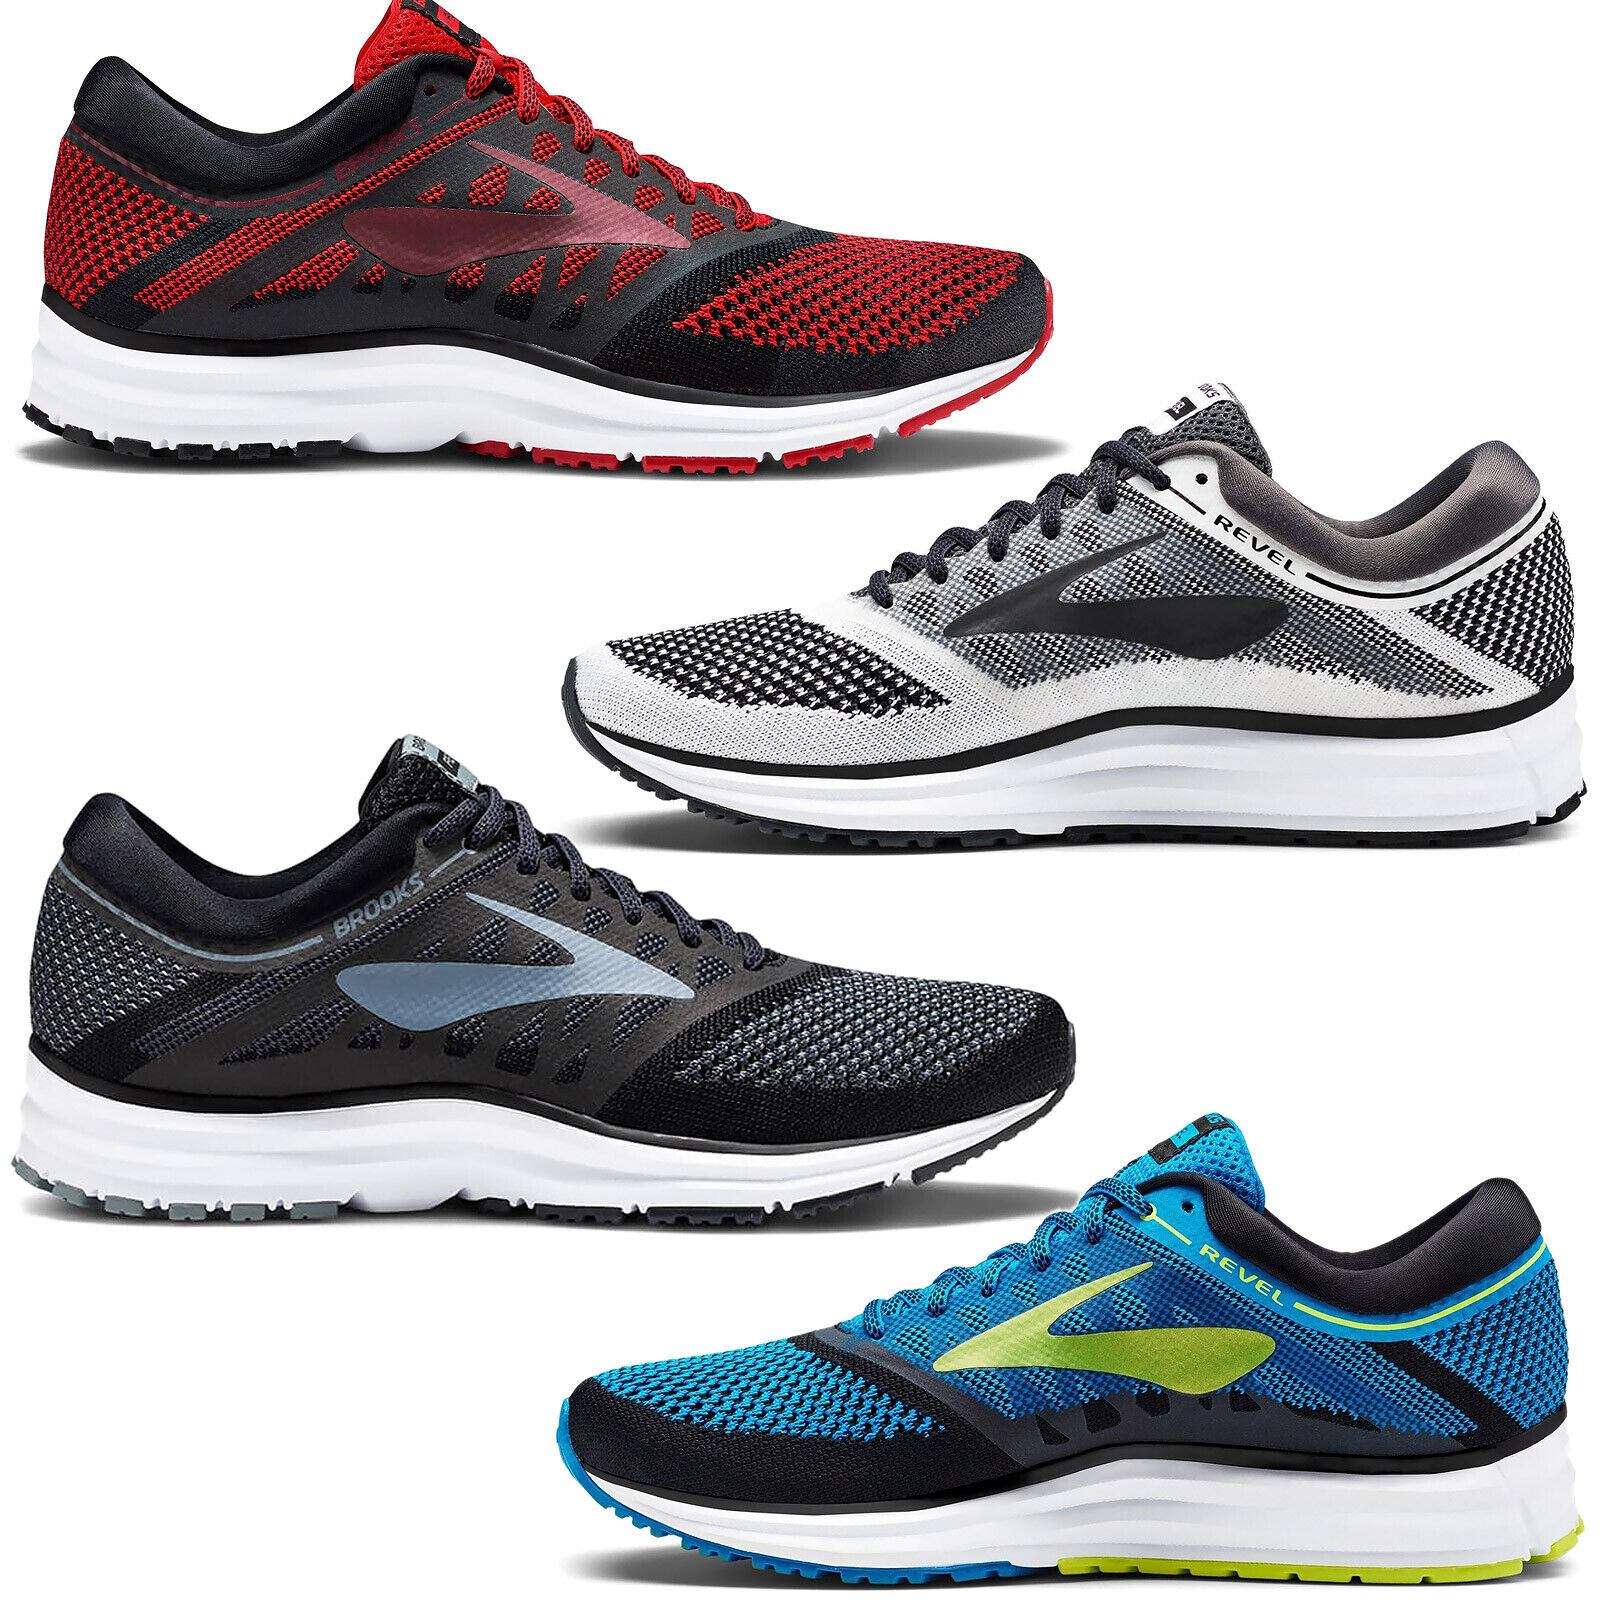 BROOKS Revel Knit Road Running Shoes, Mens